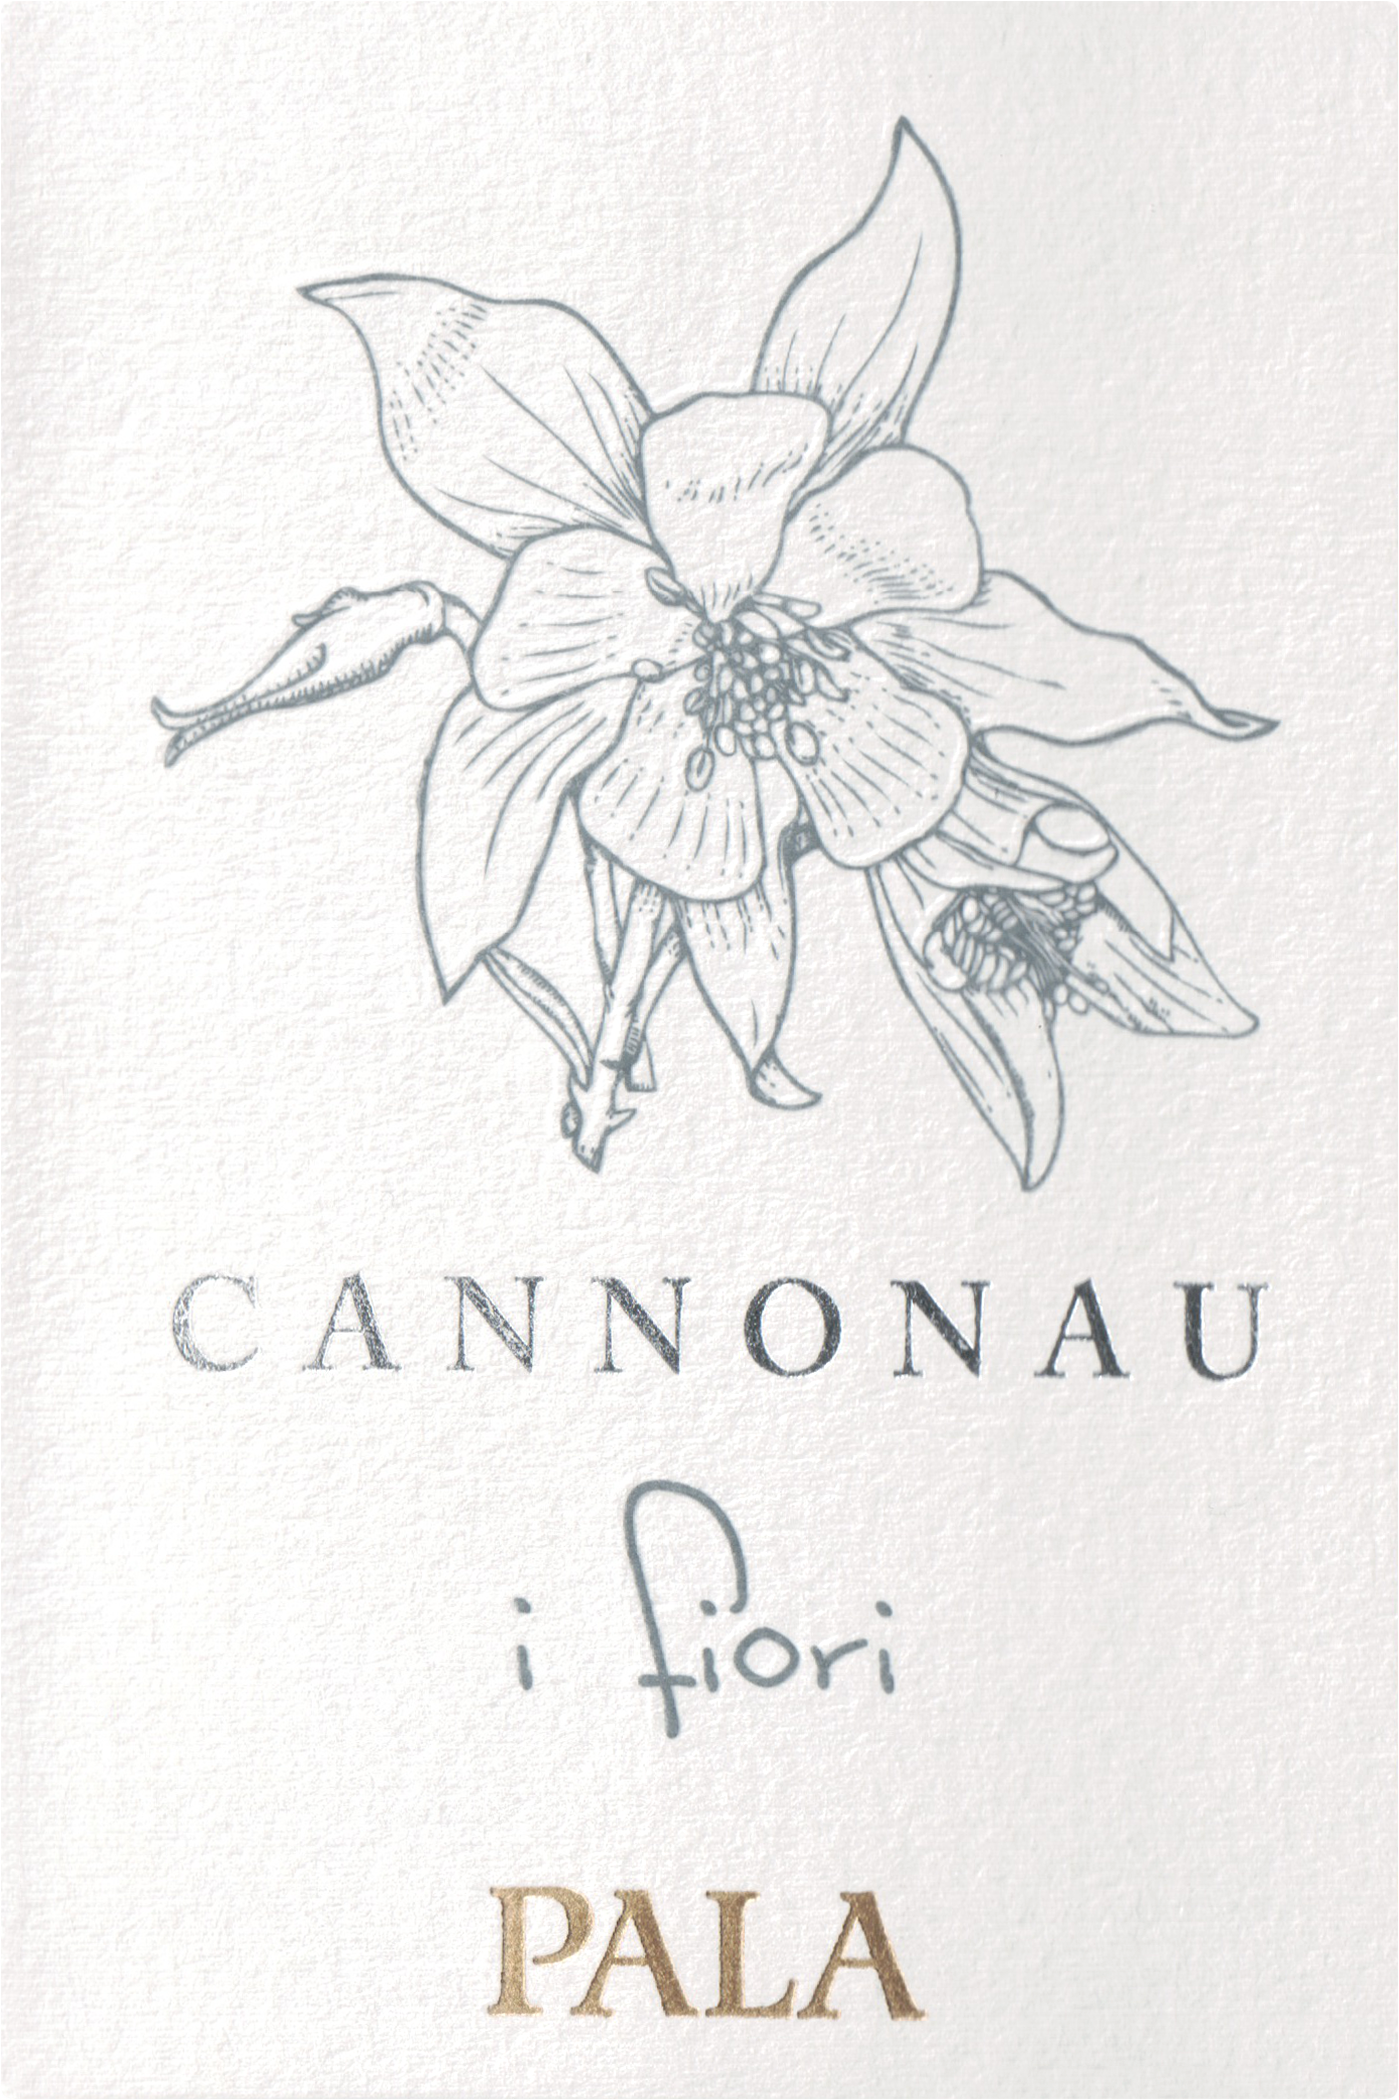 Fiori 2017.2017 Pala Cannonau I Fiori Wine Library